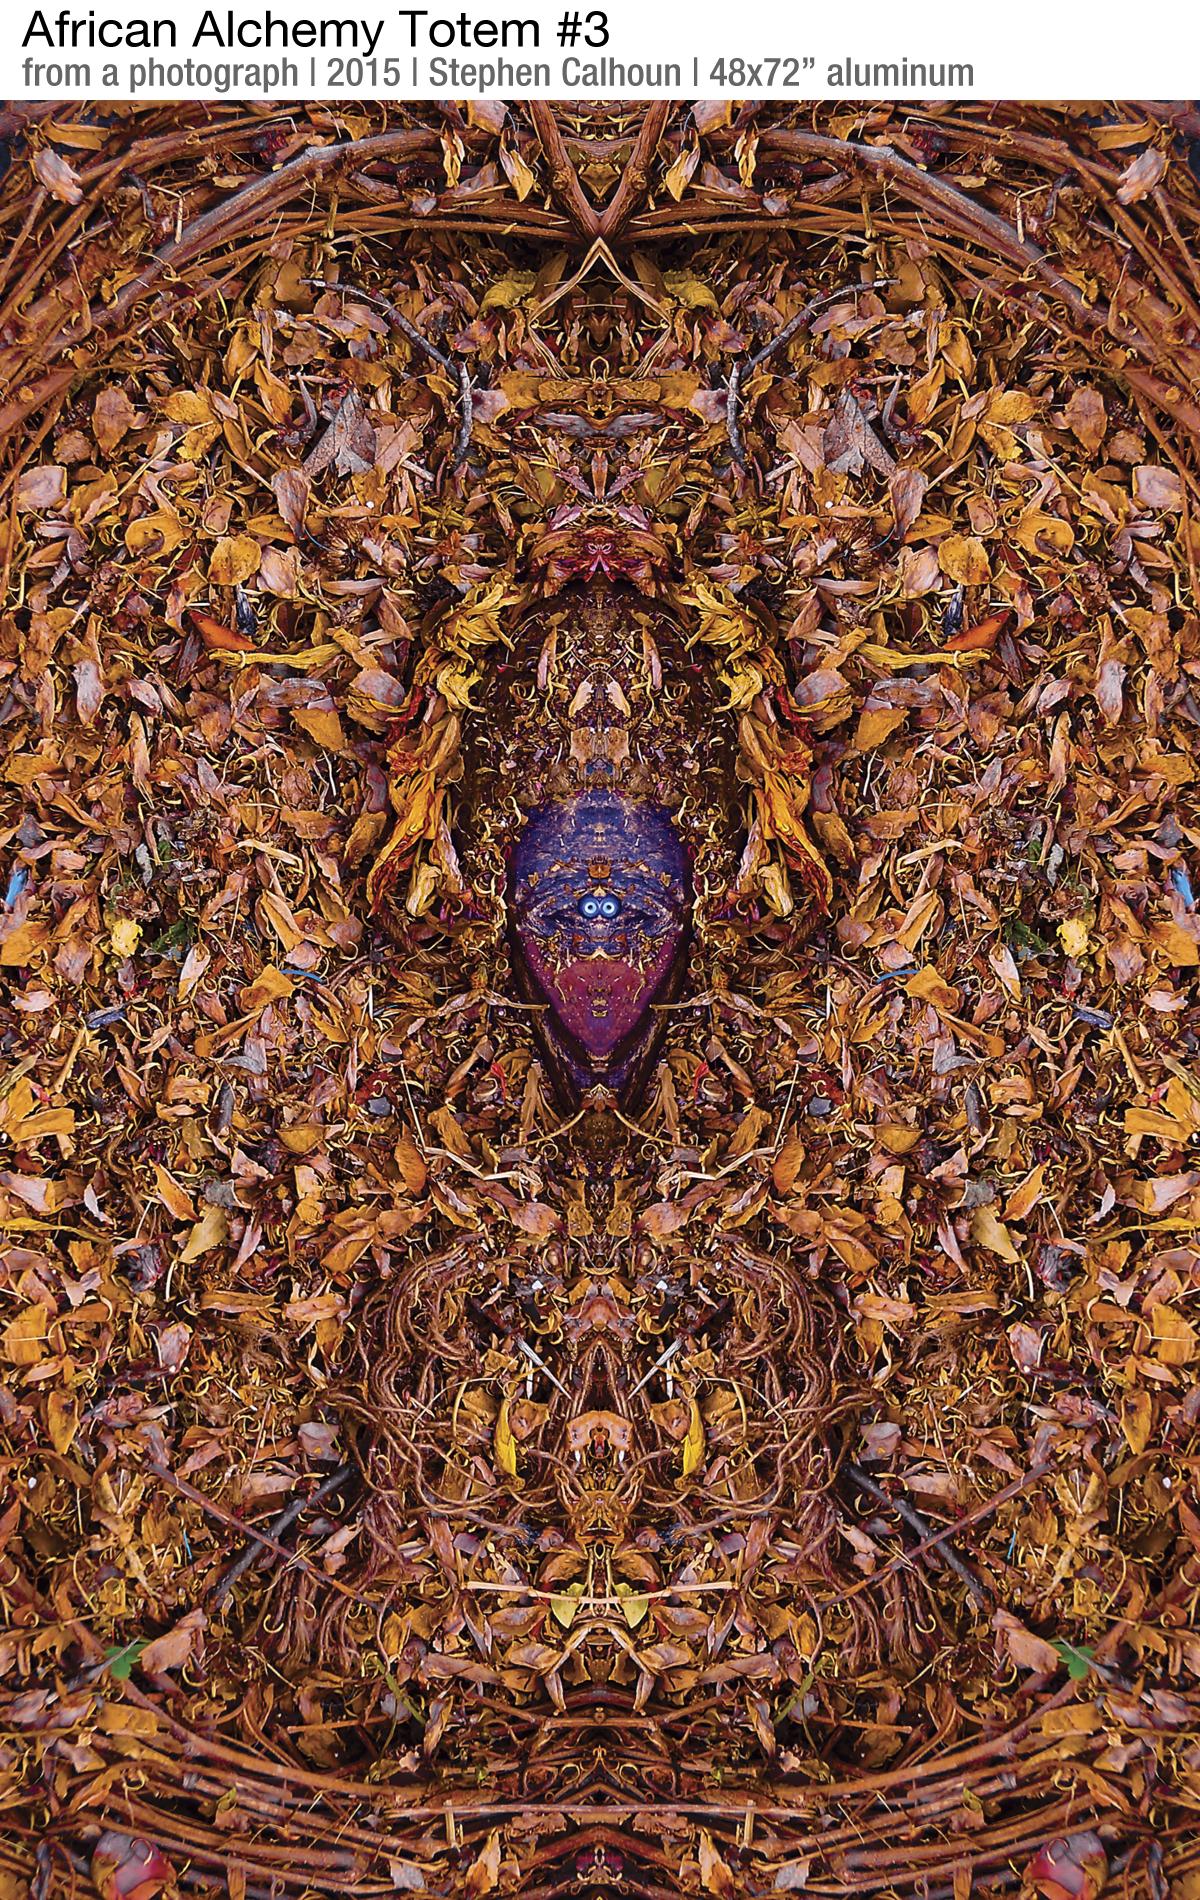 FB-Stephen-Calhoun-African Alchemy Totem #3-48x72